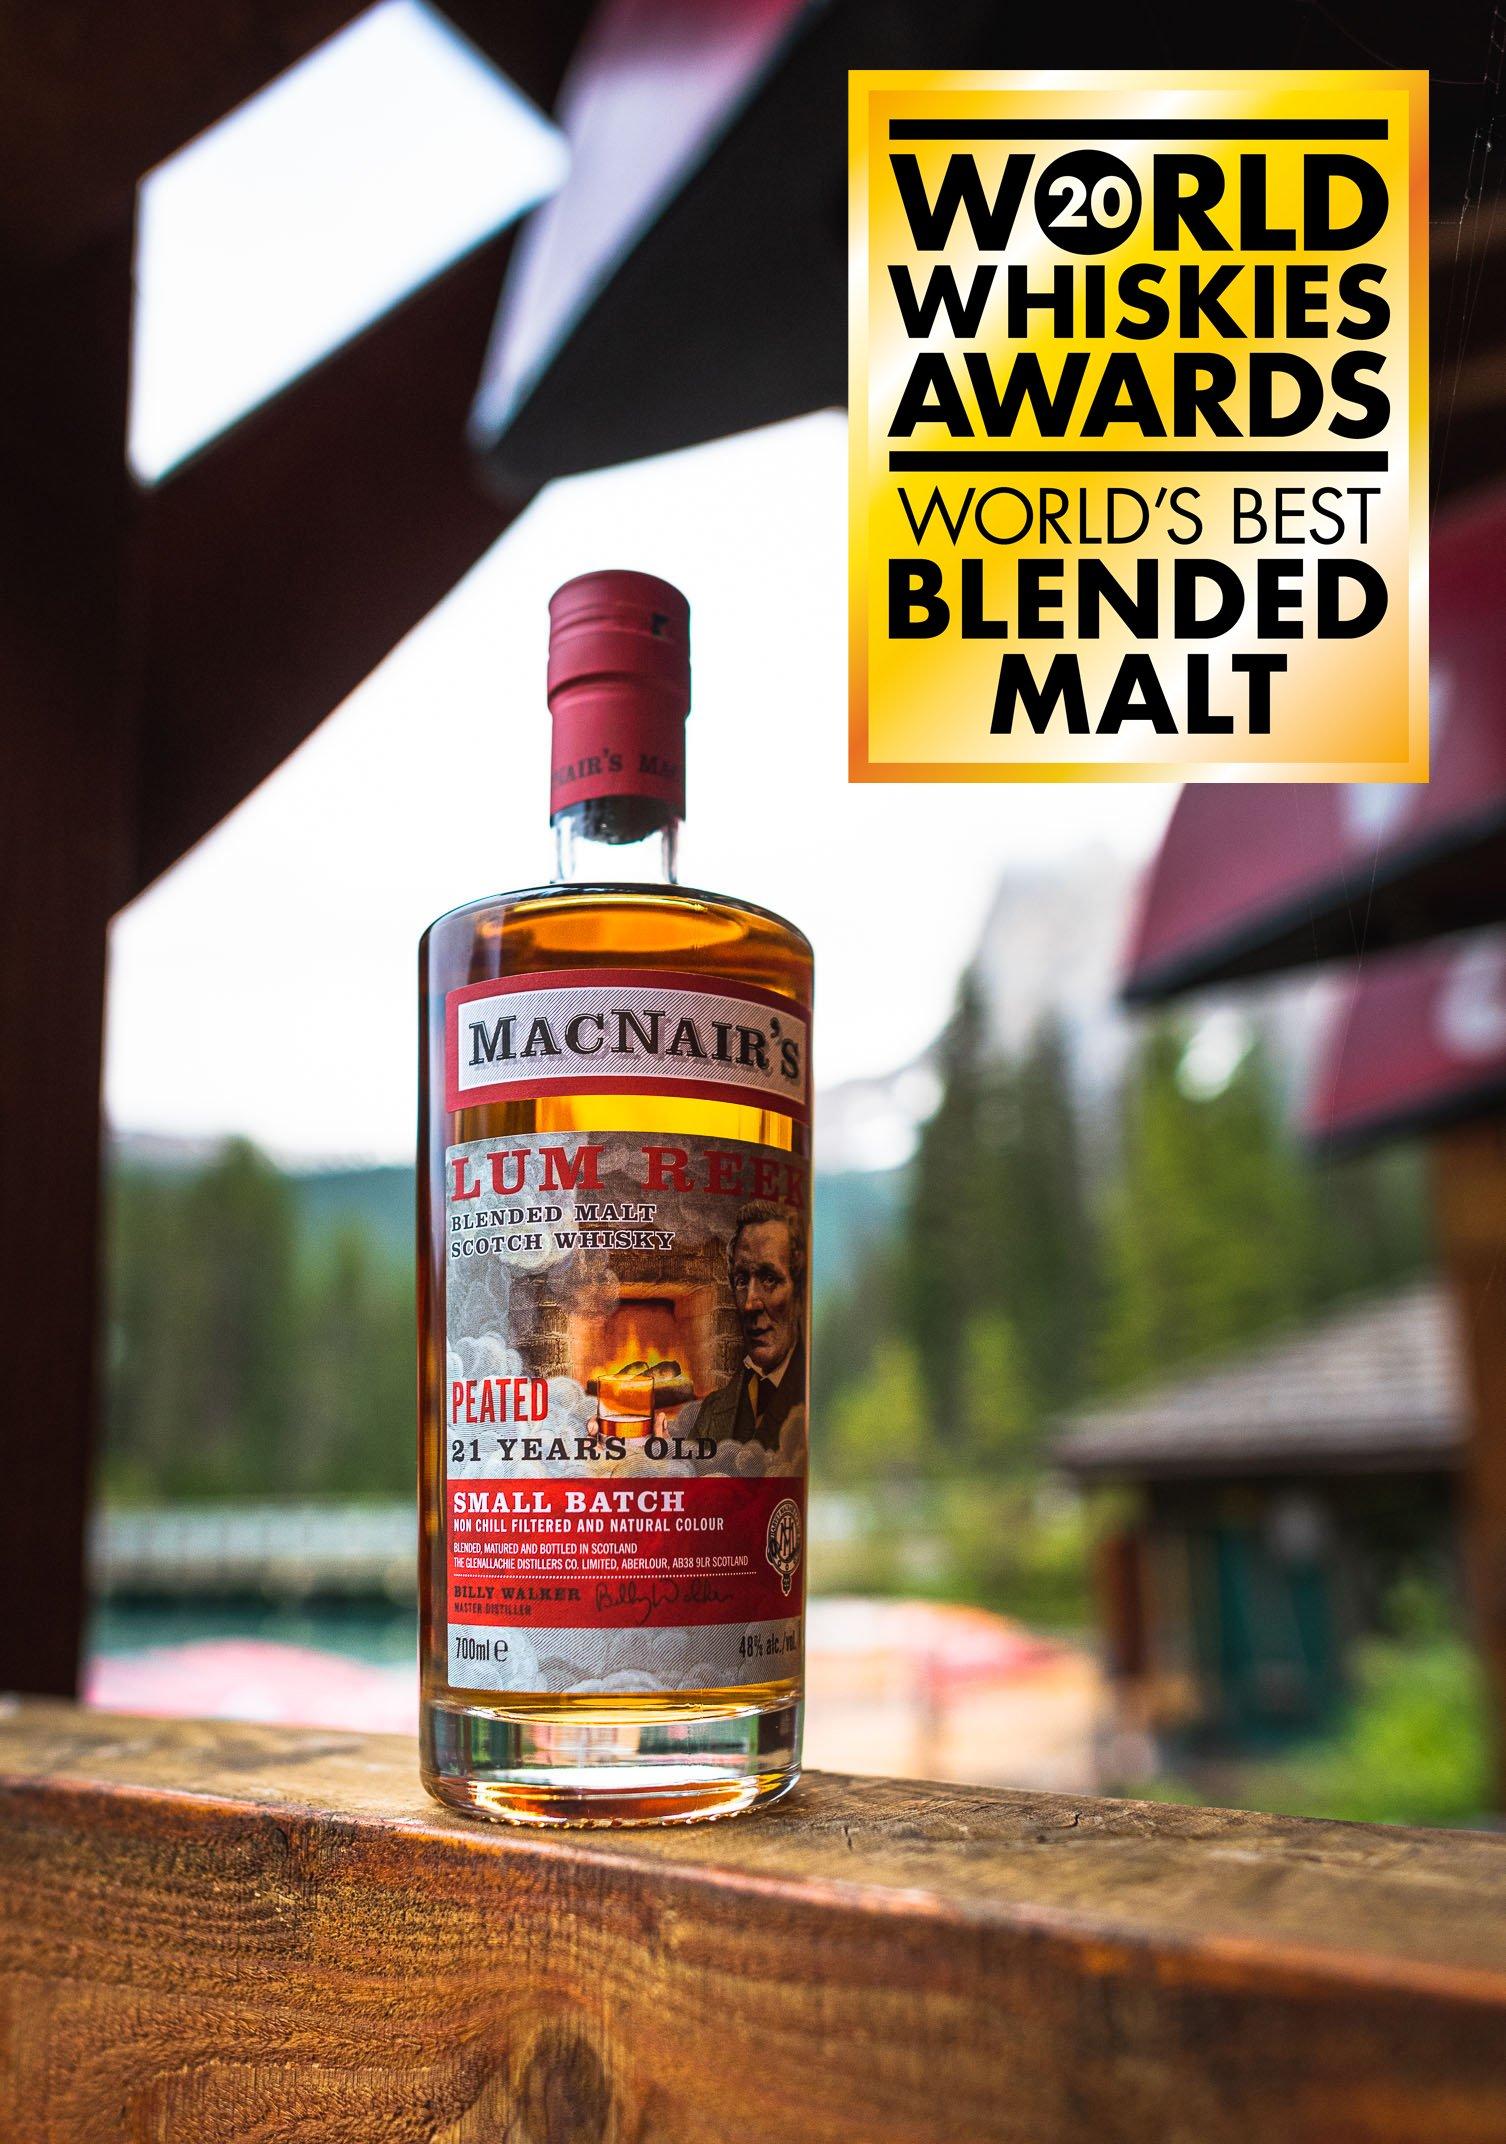 MacNair's 21 year old blended malt scotch whisky